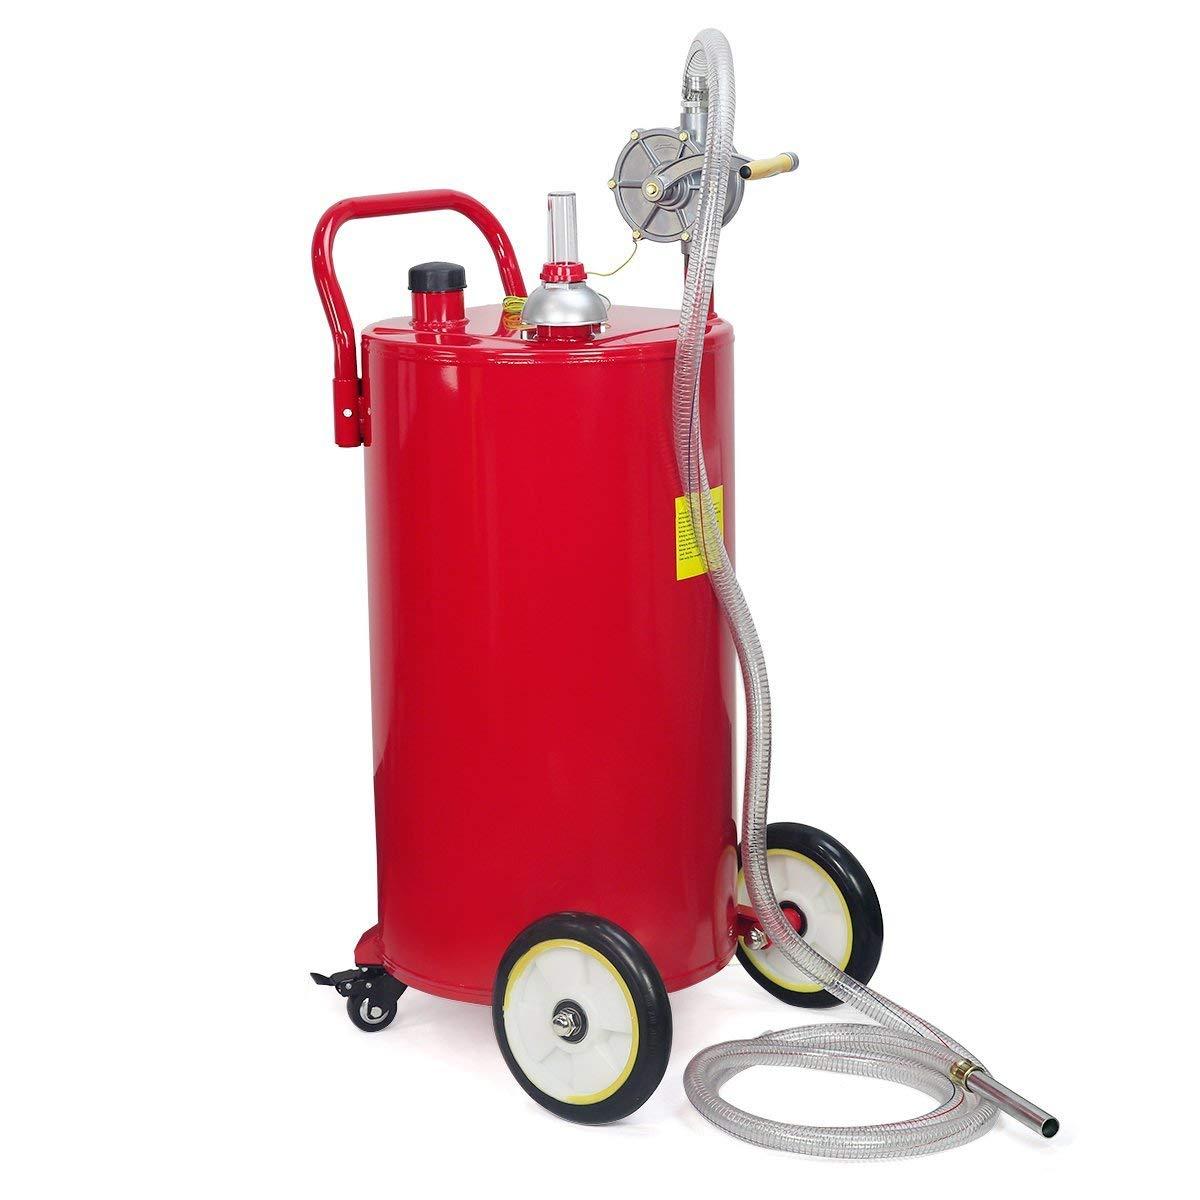 STKUSA Stark 35-Gallon Portable Fuel Transfer Gas Can Caddy Storage Tank Crank Pump 35 Gal-Capacity Pump w/Wheel by STKUSA